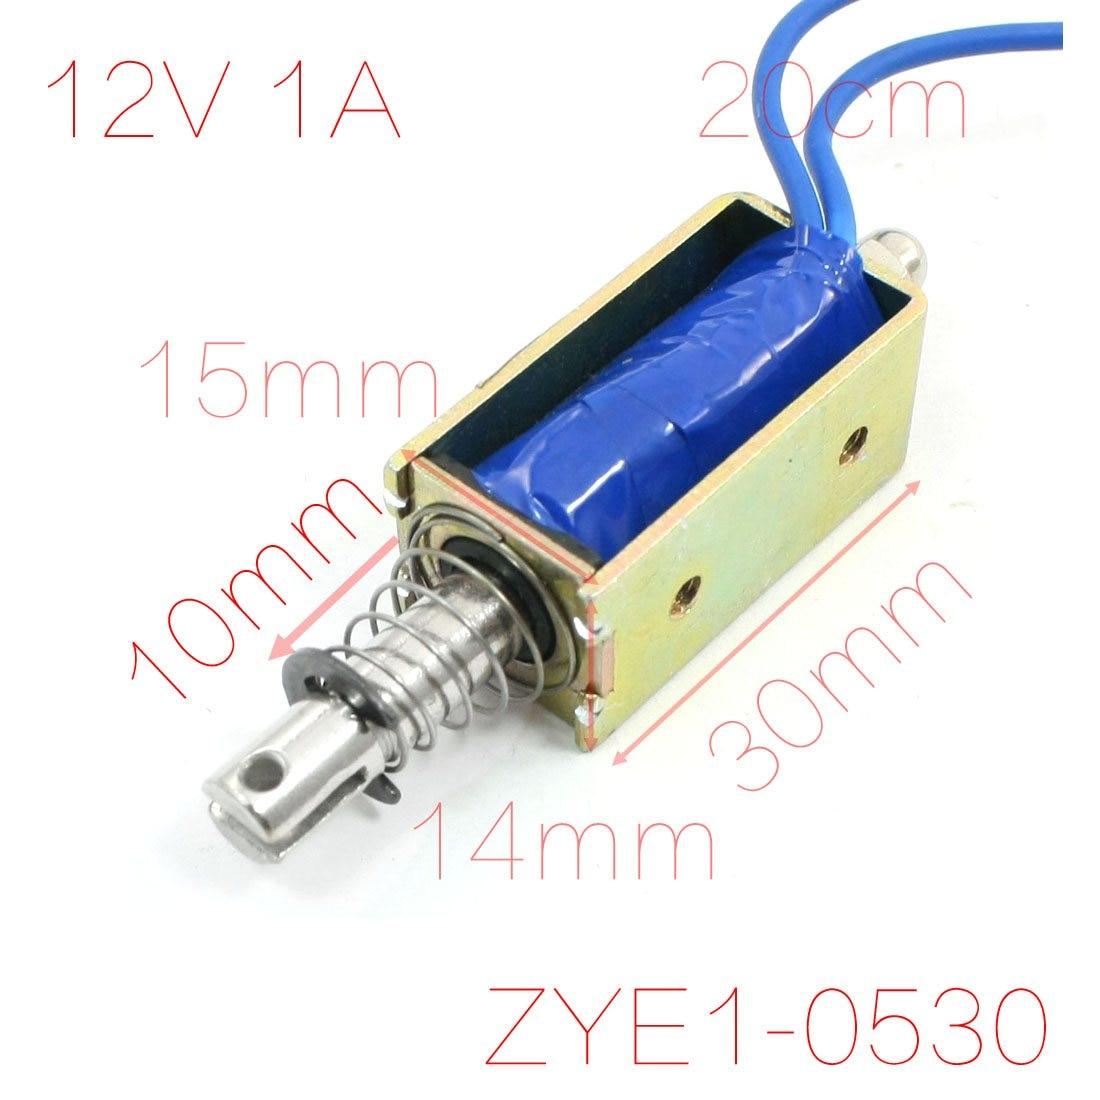 UXCELL 12V 1A 10Mm Stroke 600G Push Pull Type Open Frame Solenoid Electromagnet For Banking ATM, Vending Machines Cash Register